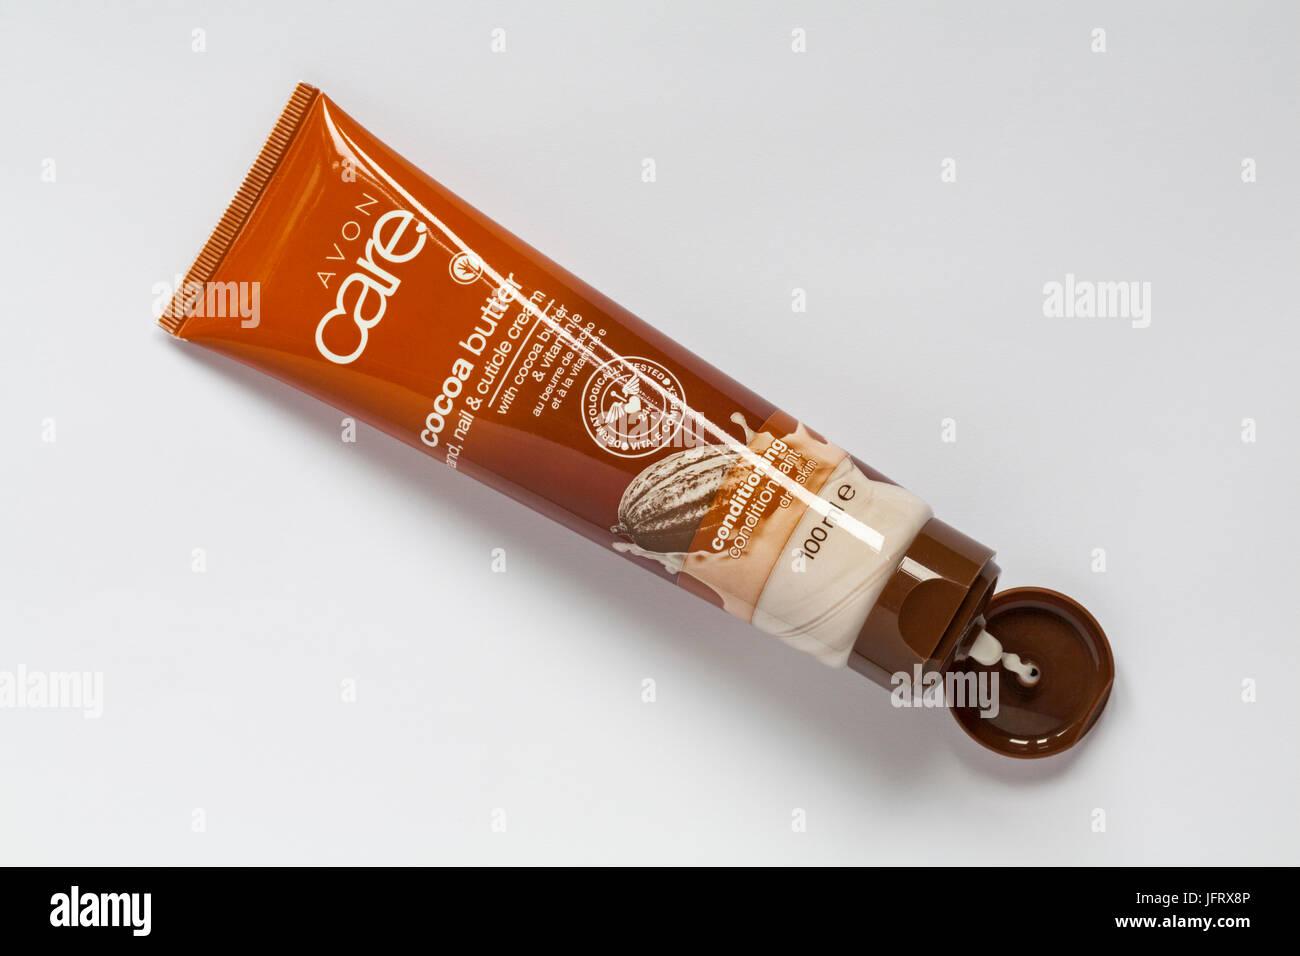 Avon Care cocoa butter hand nail & cuticle cream with cocoa butter ...